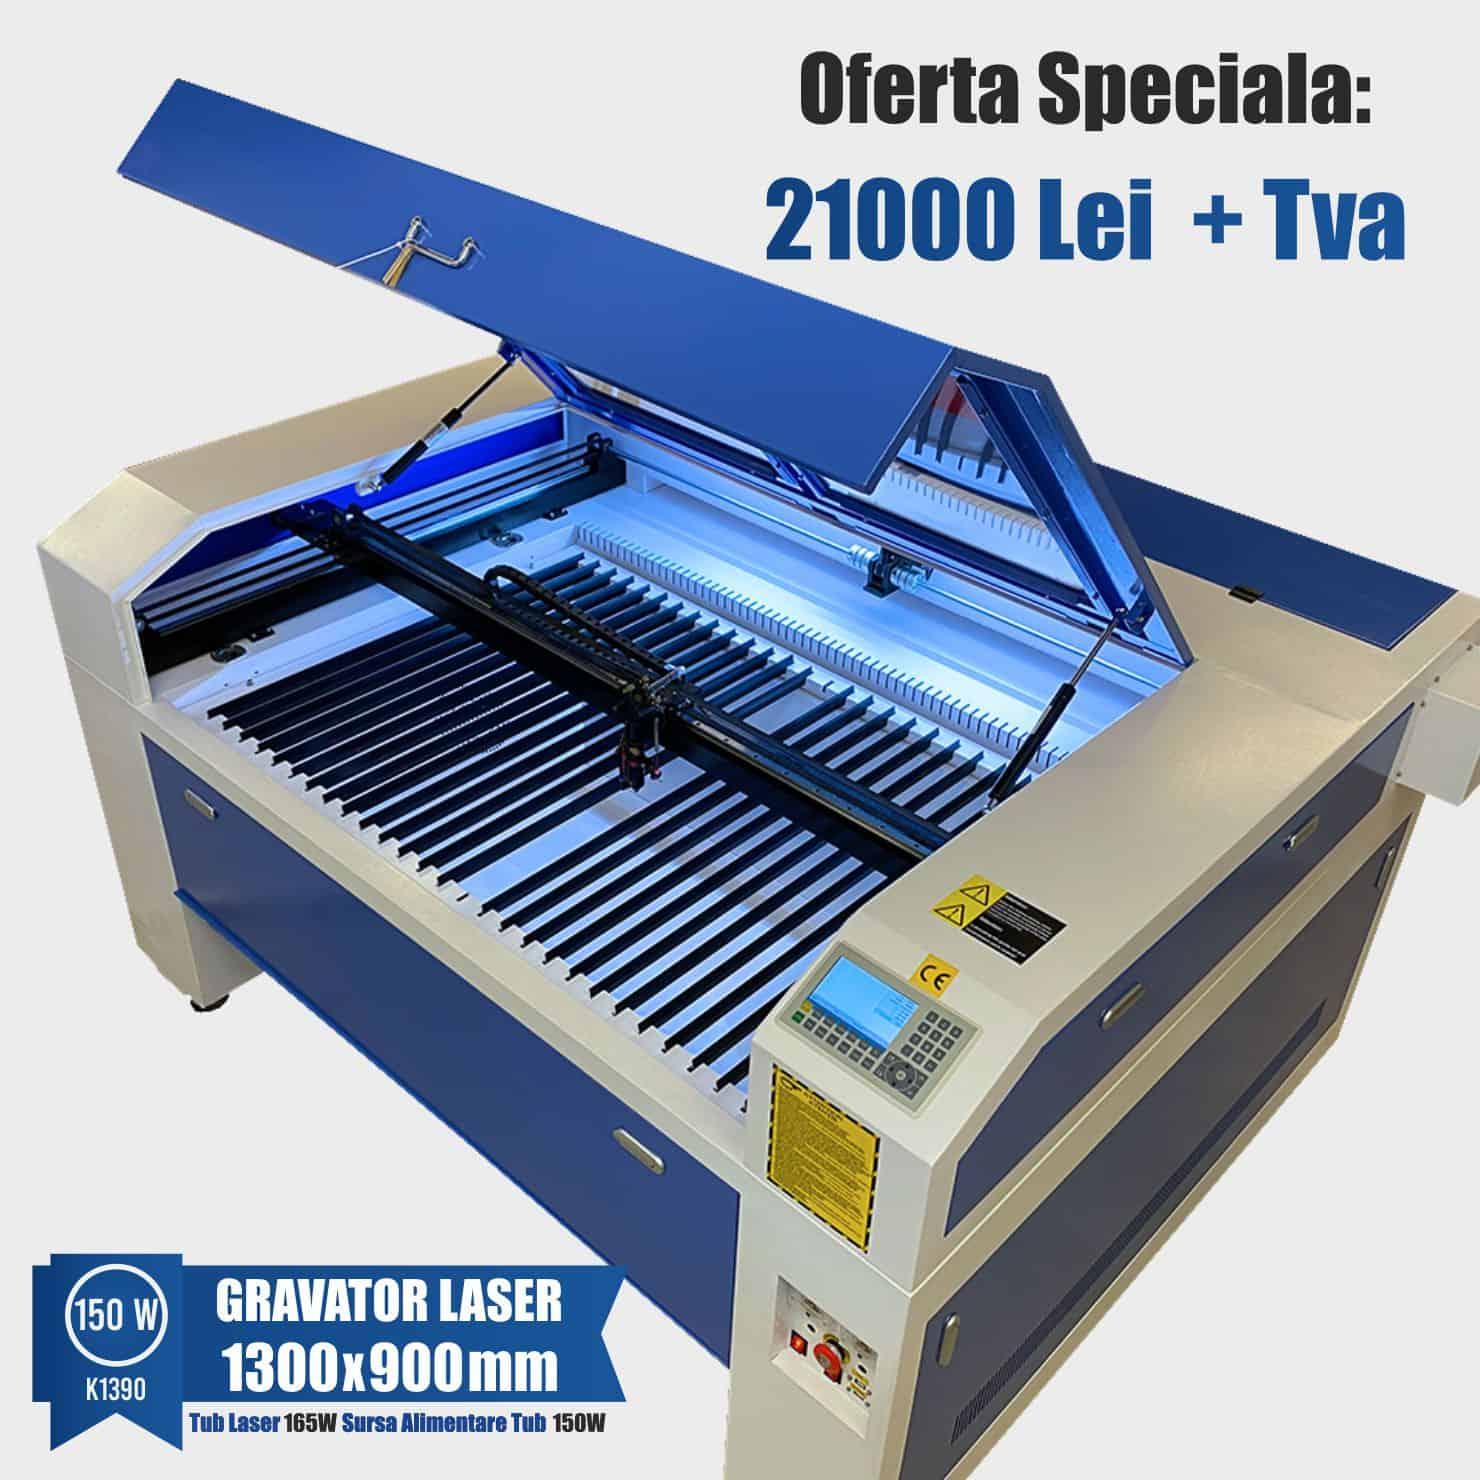 gravator laser 150w chiller cw 5200